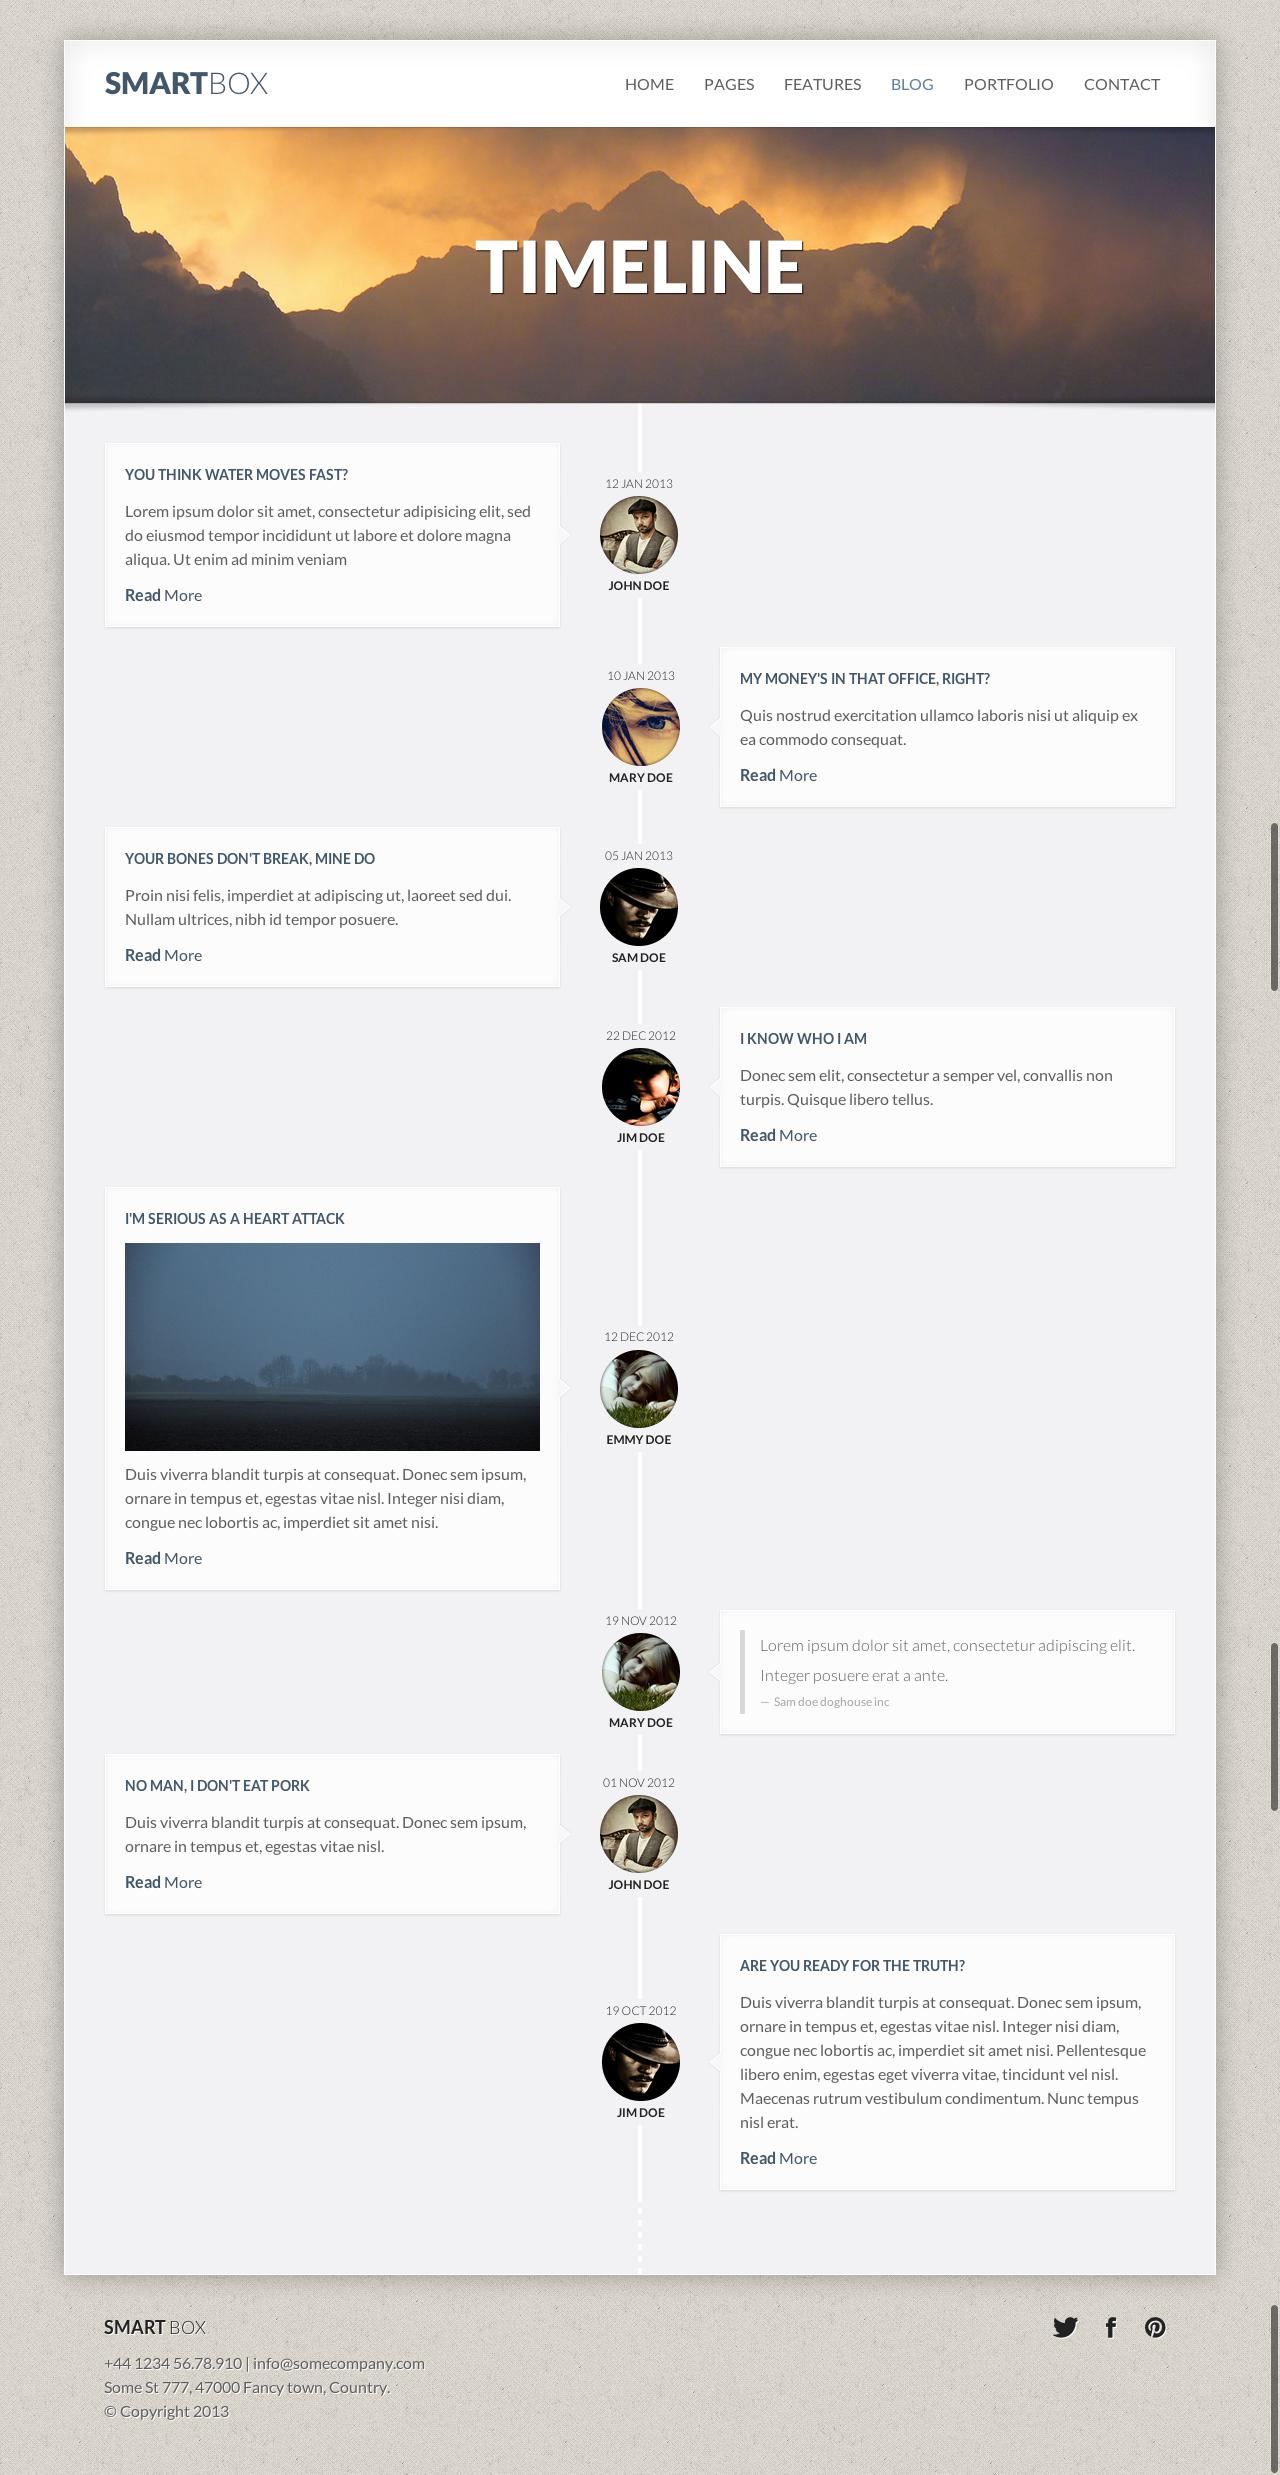 Smartbox  Responsive Wordpress Bootstrap Theme  Timeline